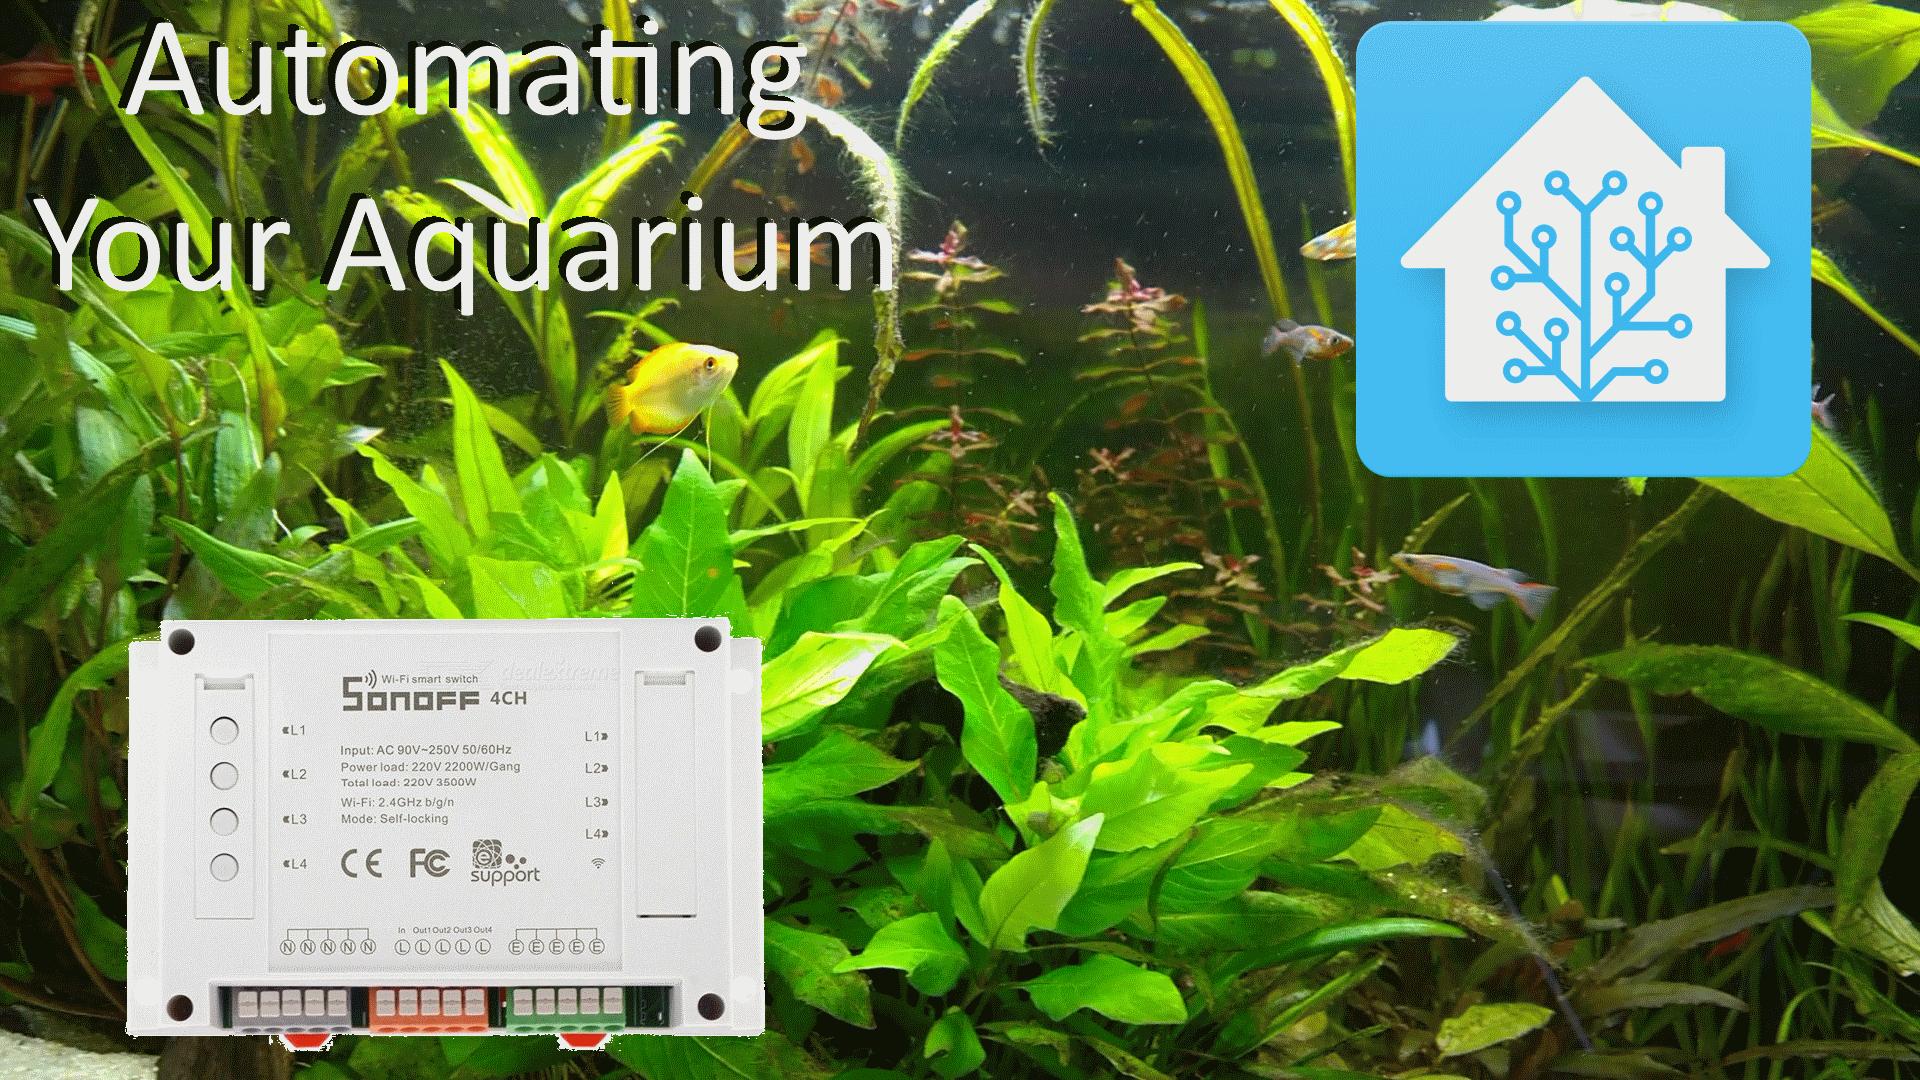 DIY NAS - Installing OpenMediaVault (OMV) on a Raspberry Pi